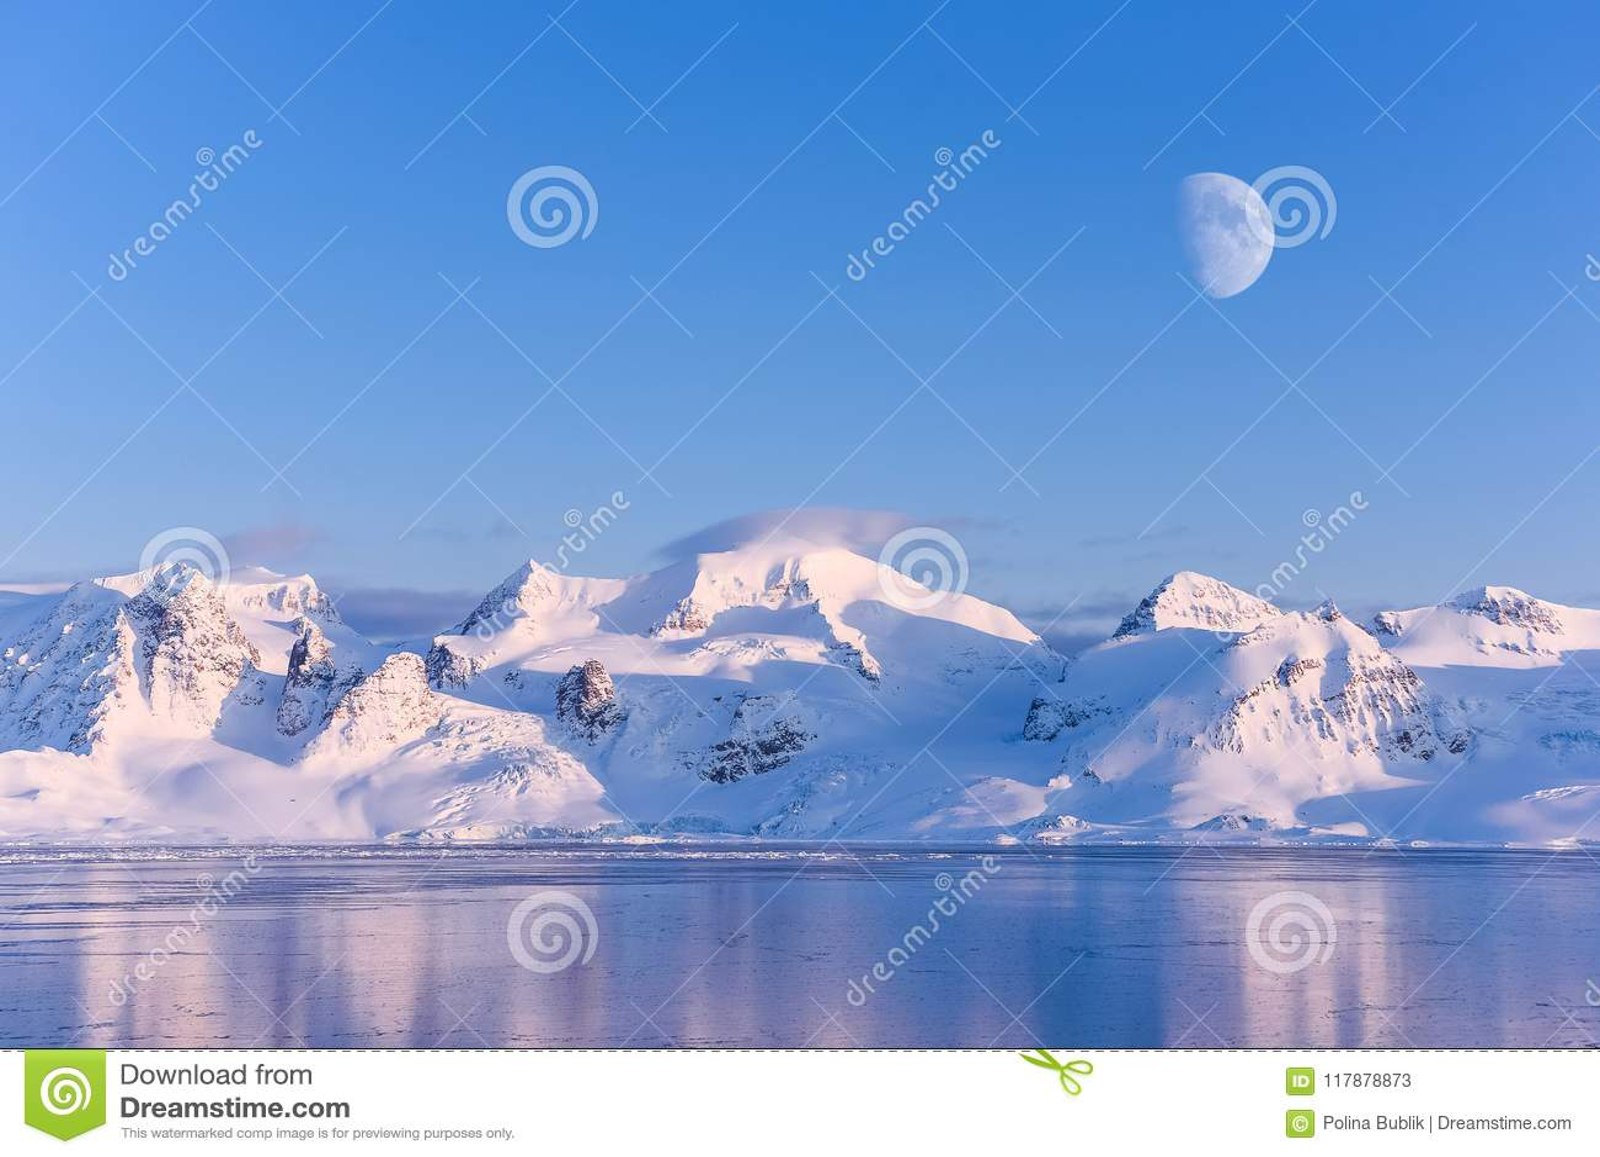 Landscape nature of the mountains of Spitsbergen Longyearbyen Svalbard arctic ocean winter polar day sunset